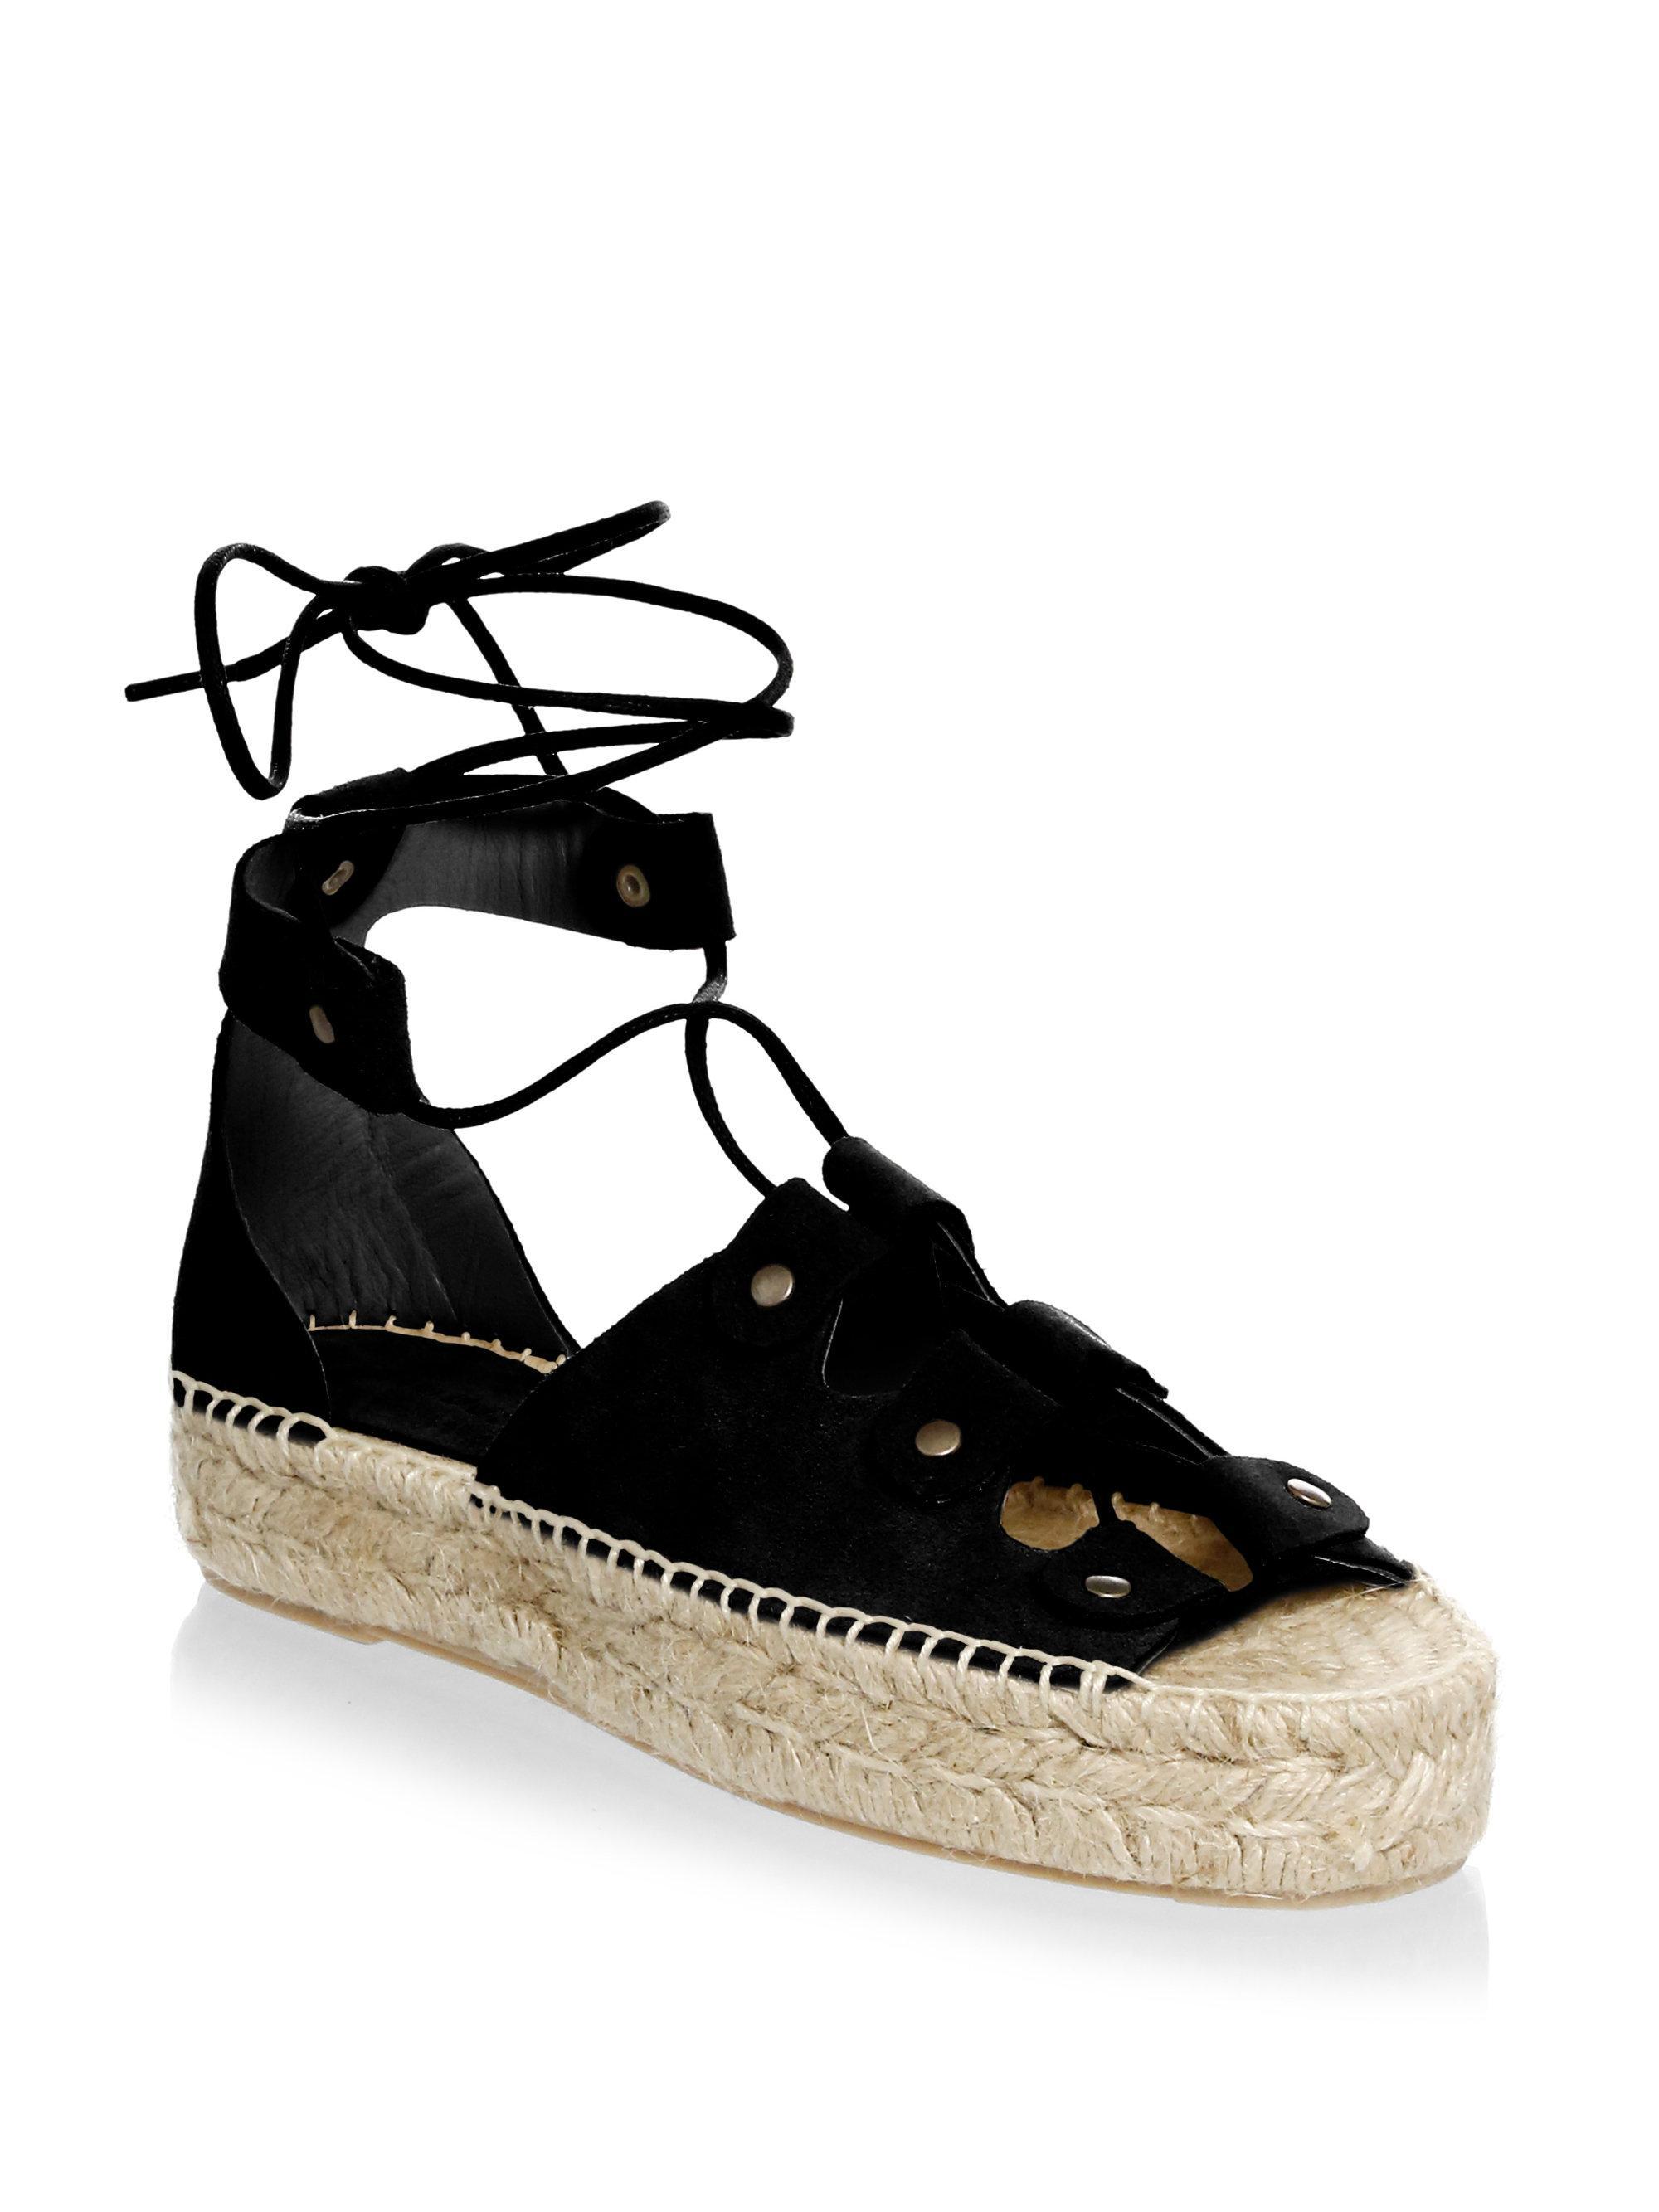 835c9ba6f0e Lyst - Soludos Ghillie Suede Platform Espadrille Sandals in Black